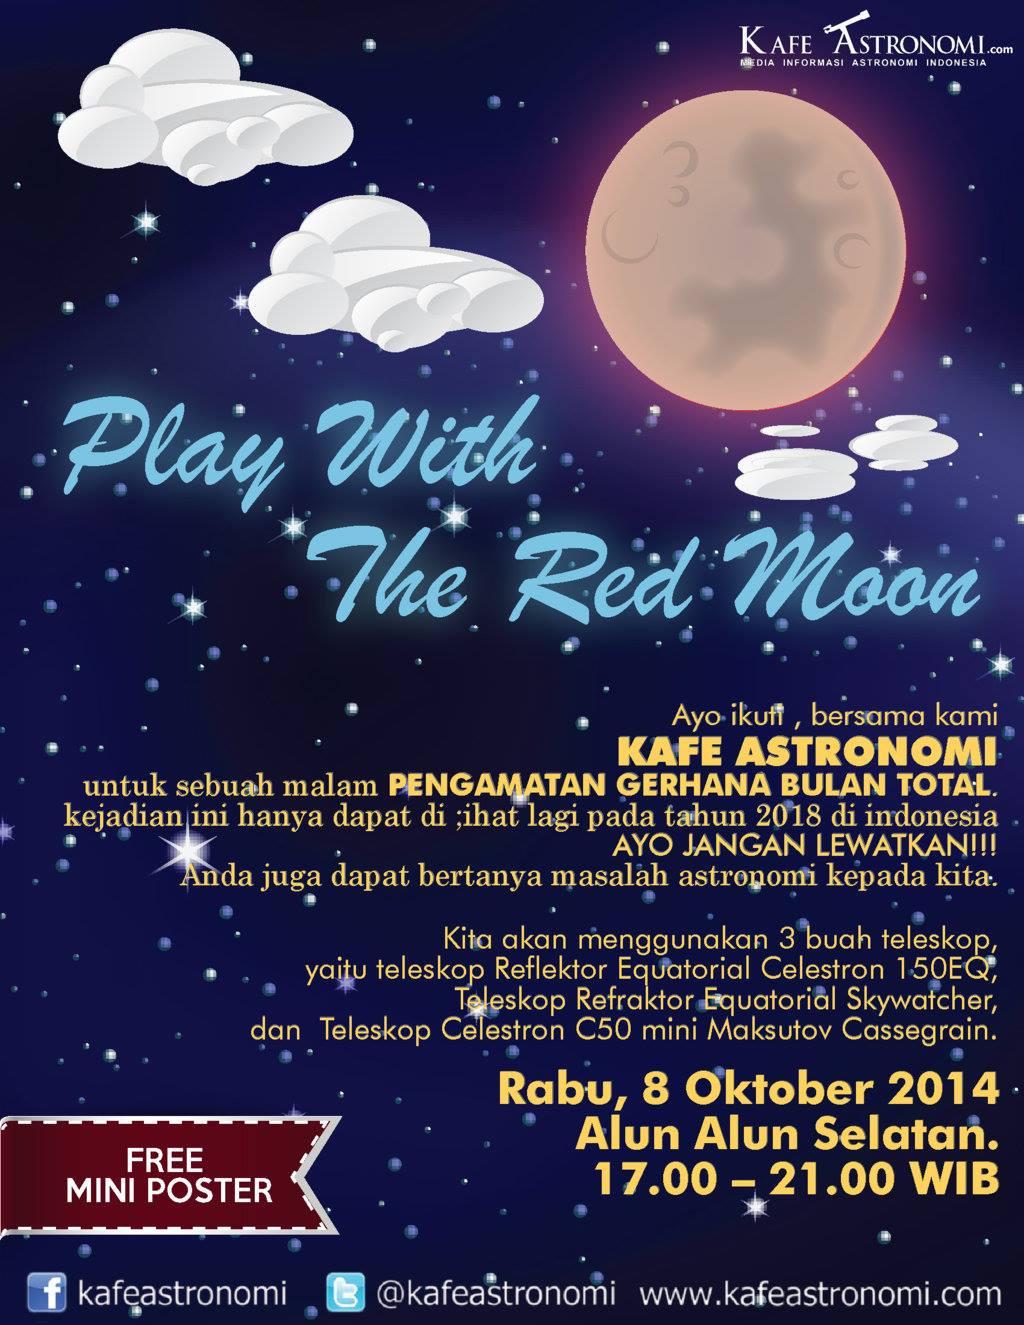 Poster Undangan Pengamatan Gerhana Bulan Total